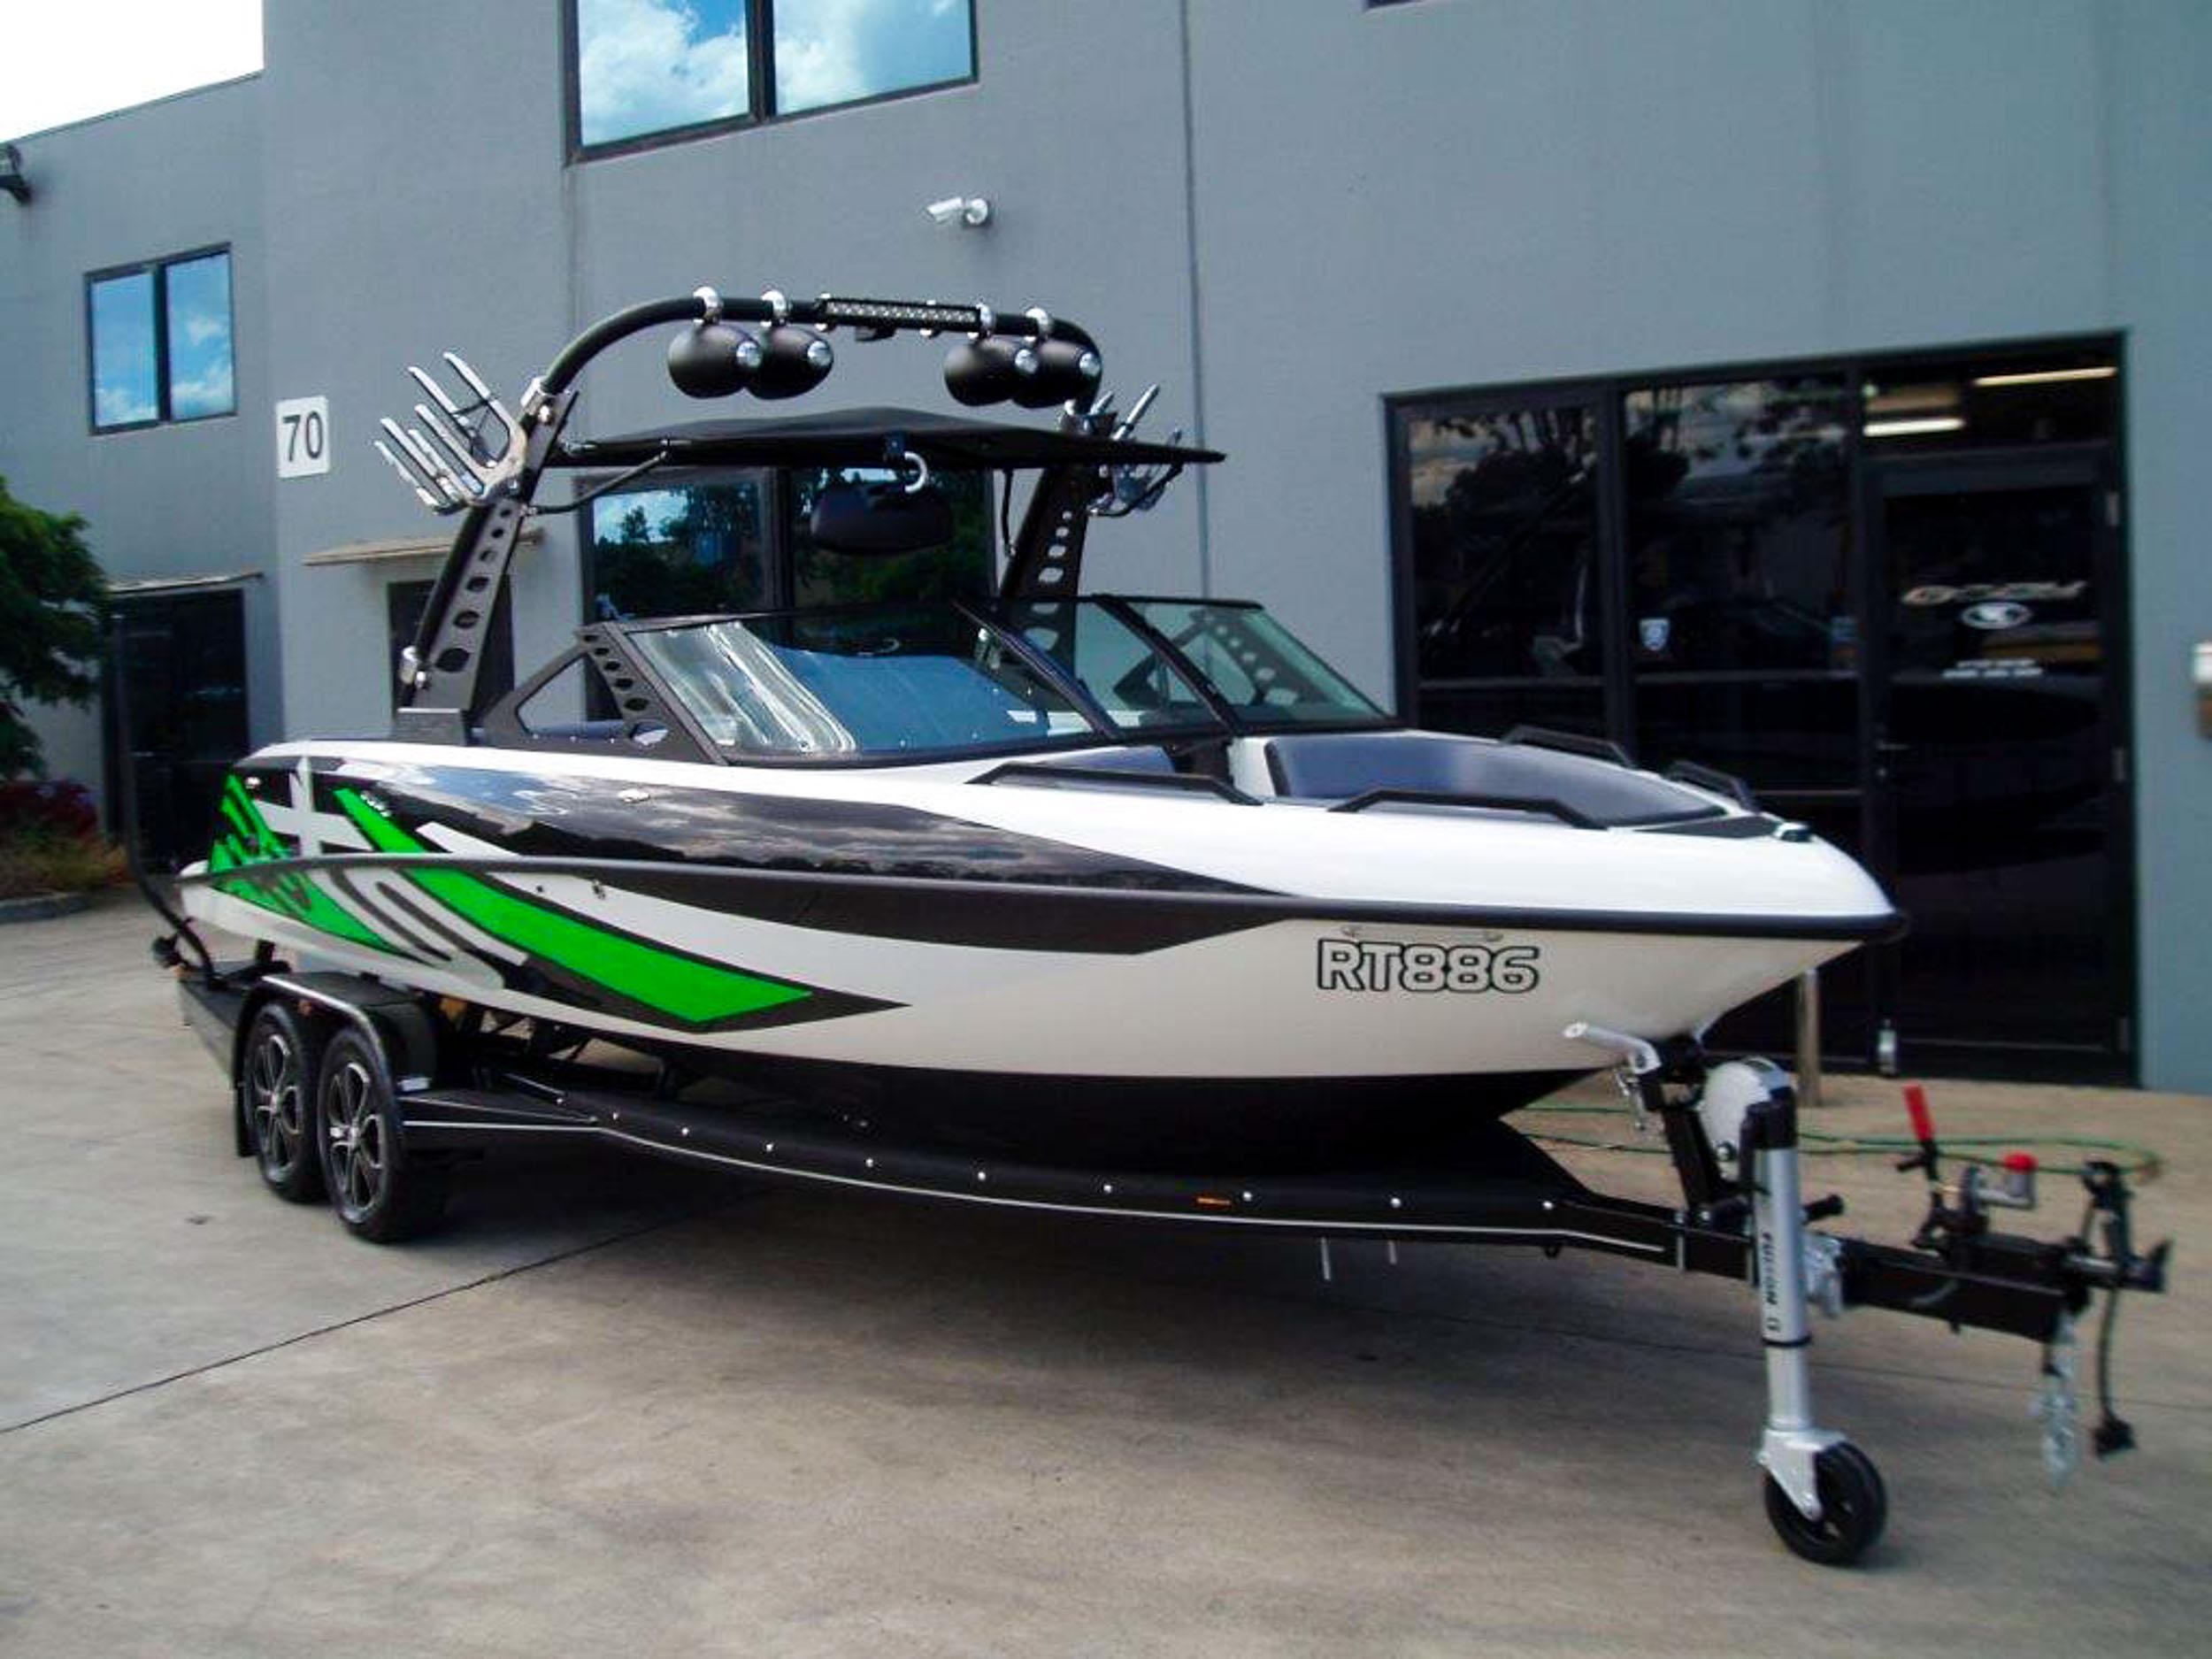 Spy_Boats_XS22-1.jpg